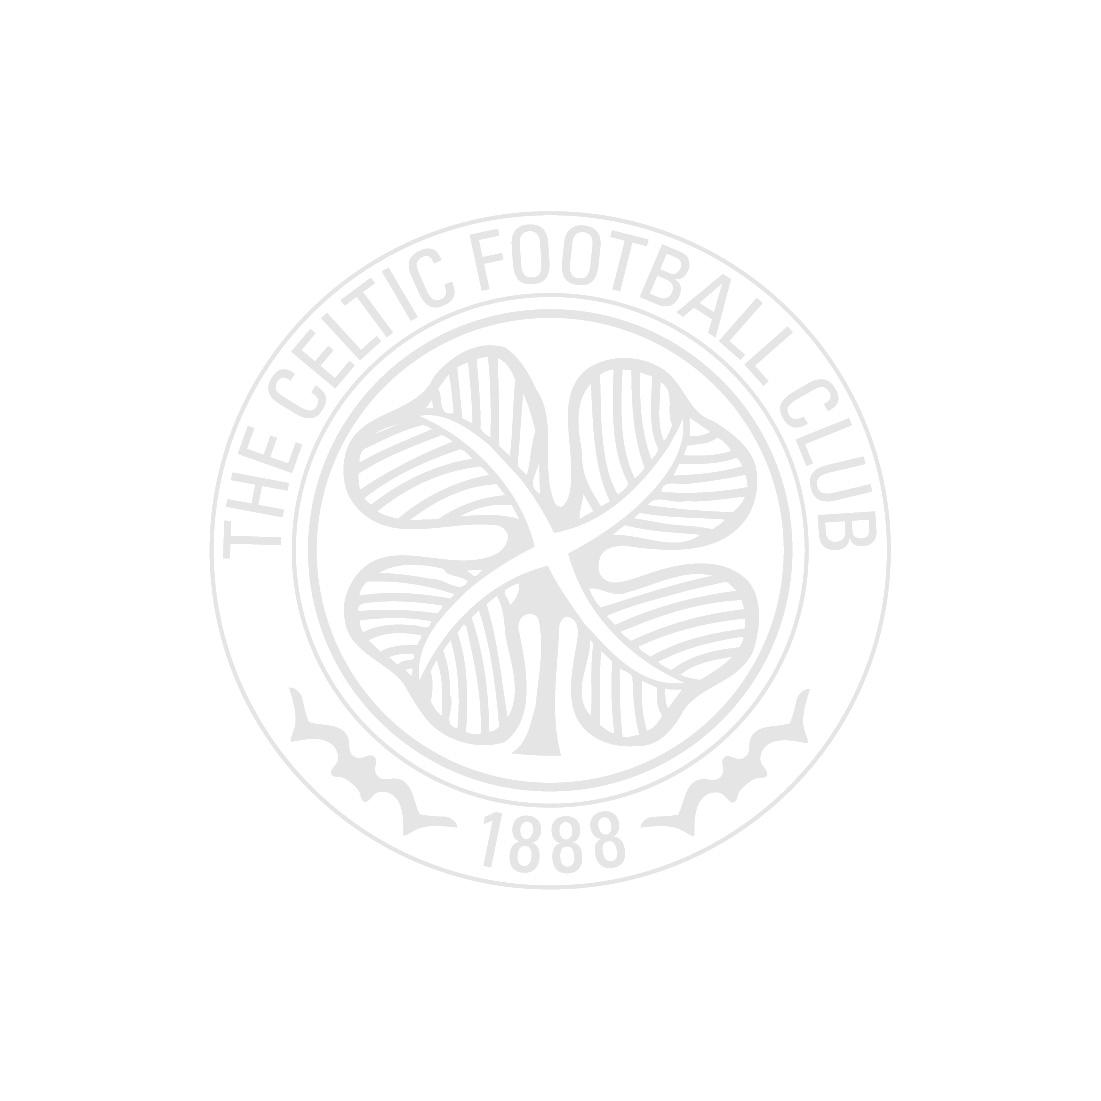 Celtic Mens Elite Away Shirt 19/20 with Sponsor